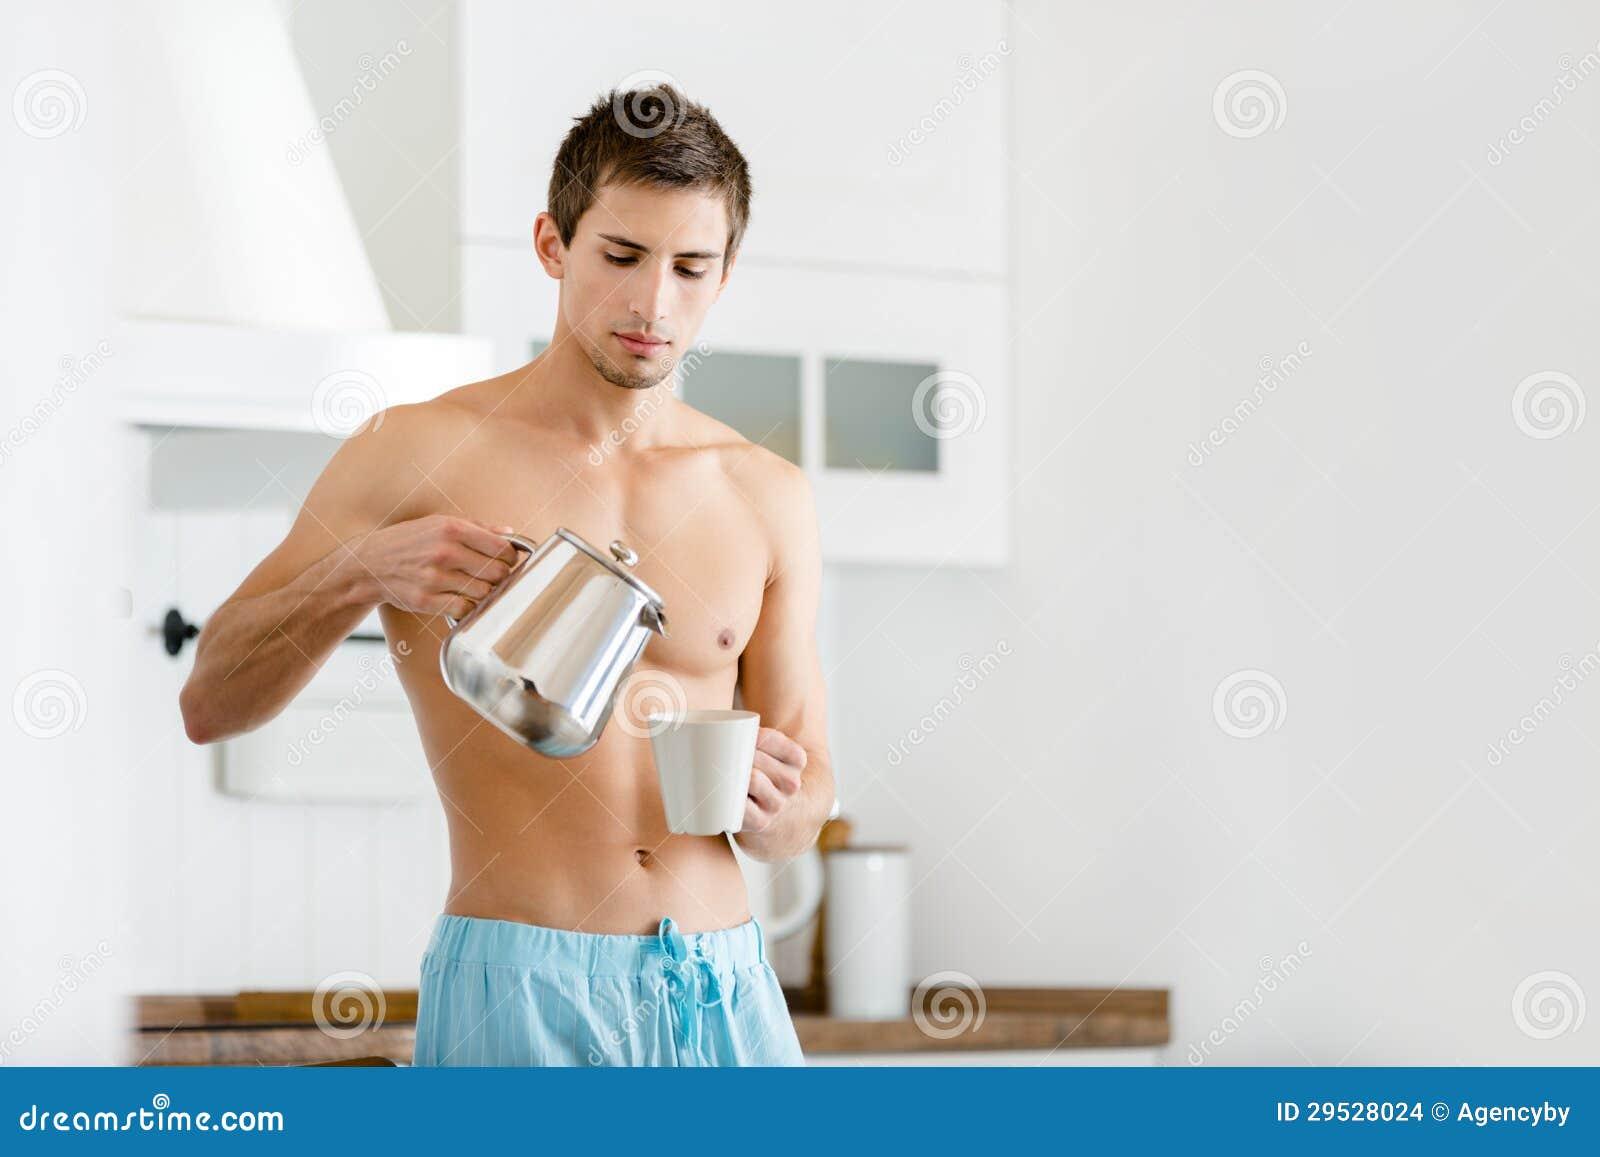 Chá de derramamento masculino semi-nua na cozinha